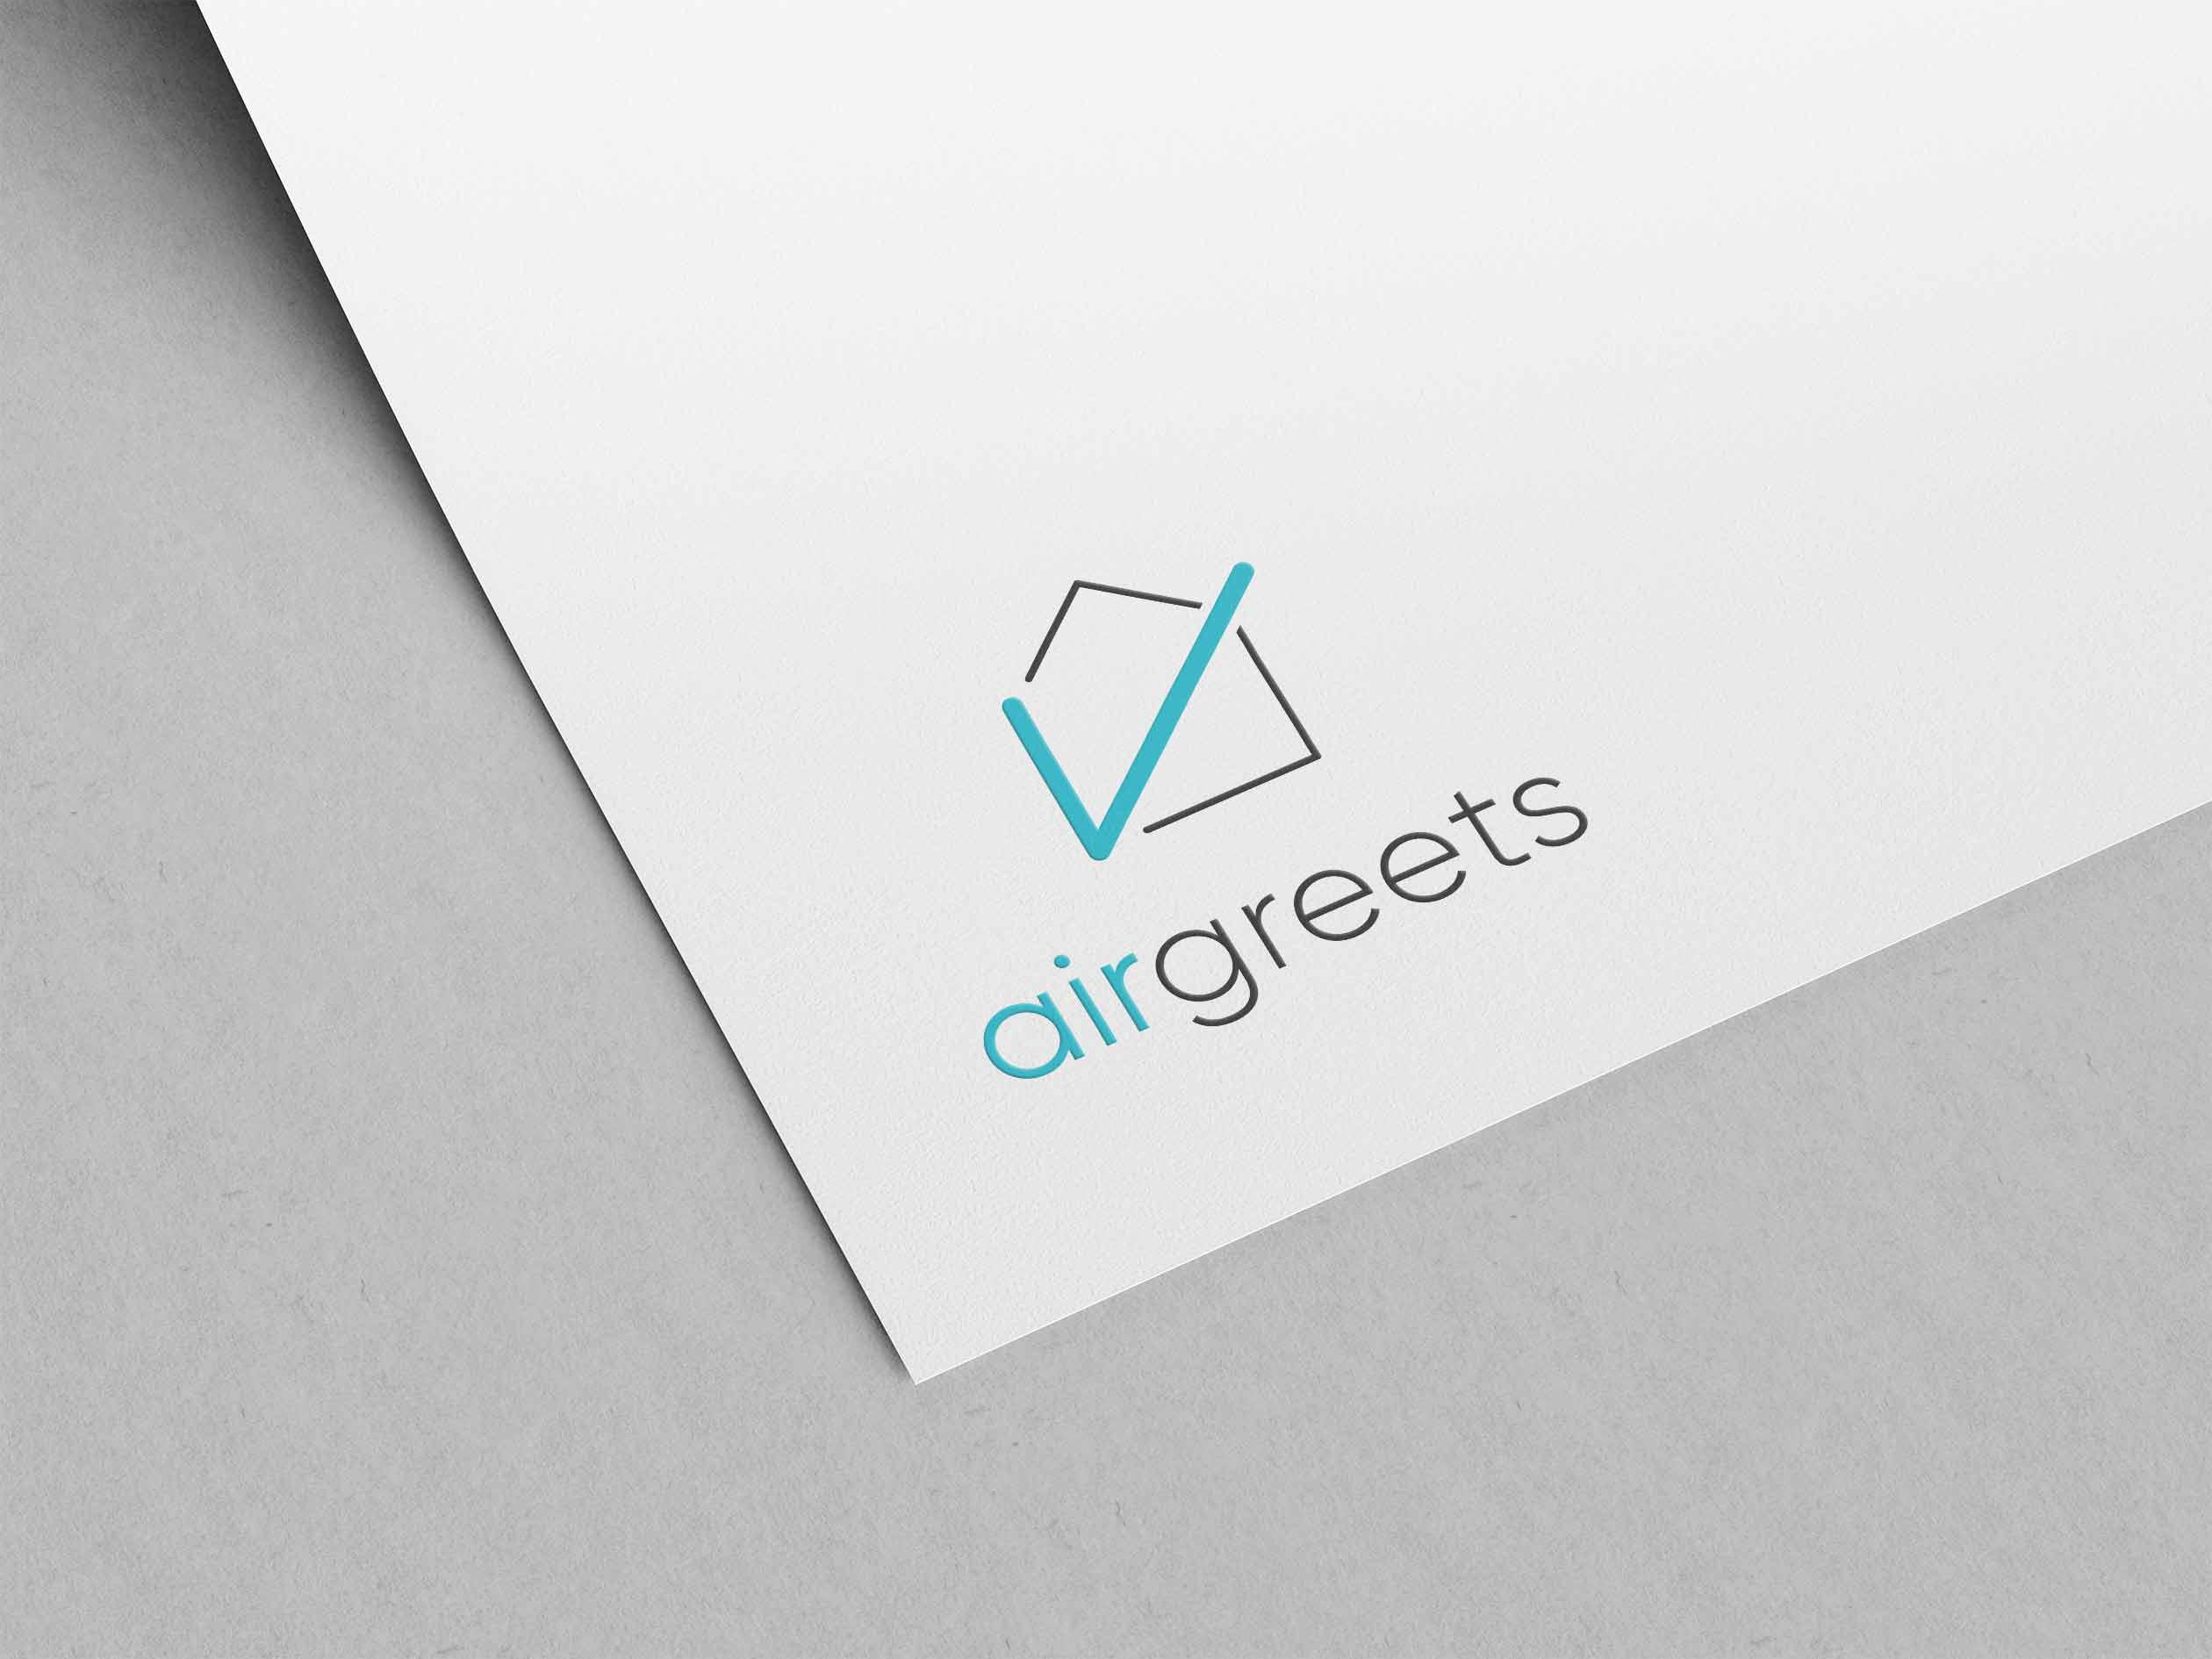 airgreets_logo-mockup_05